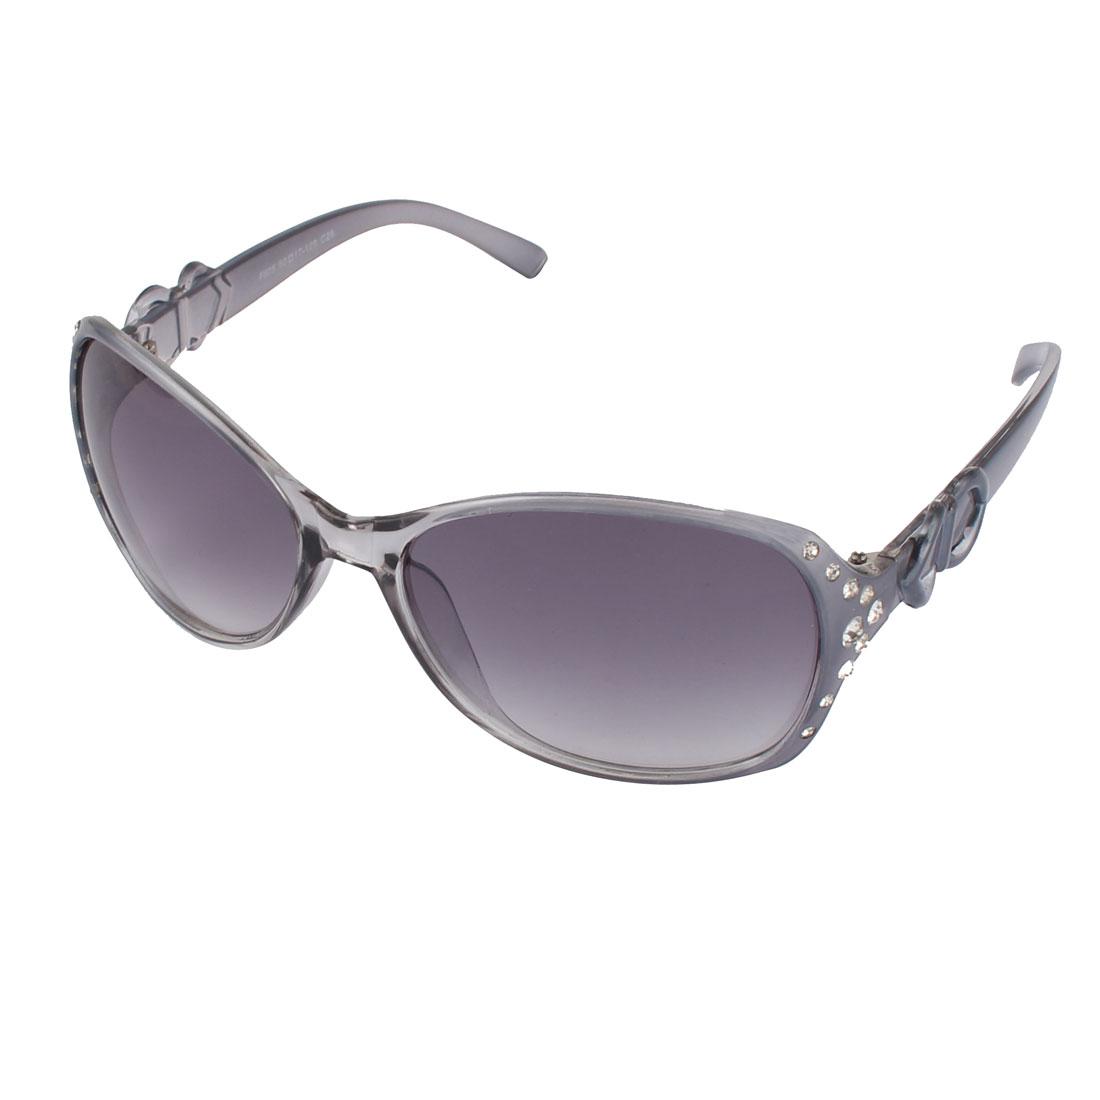 Ladies Sports Full Frame Manmade Rhinestone Lens Plastic Sunglasses Gray